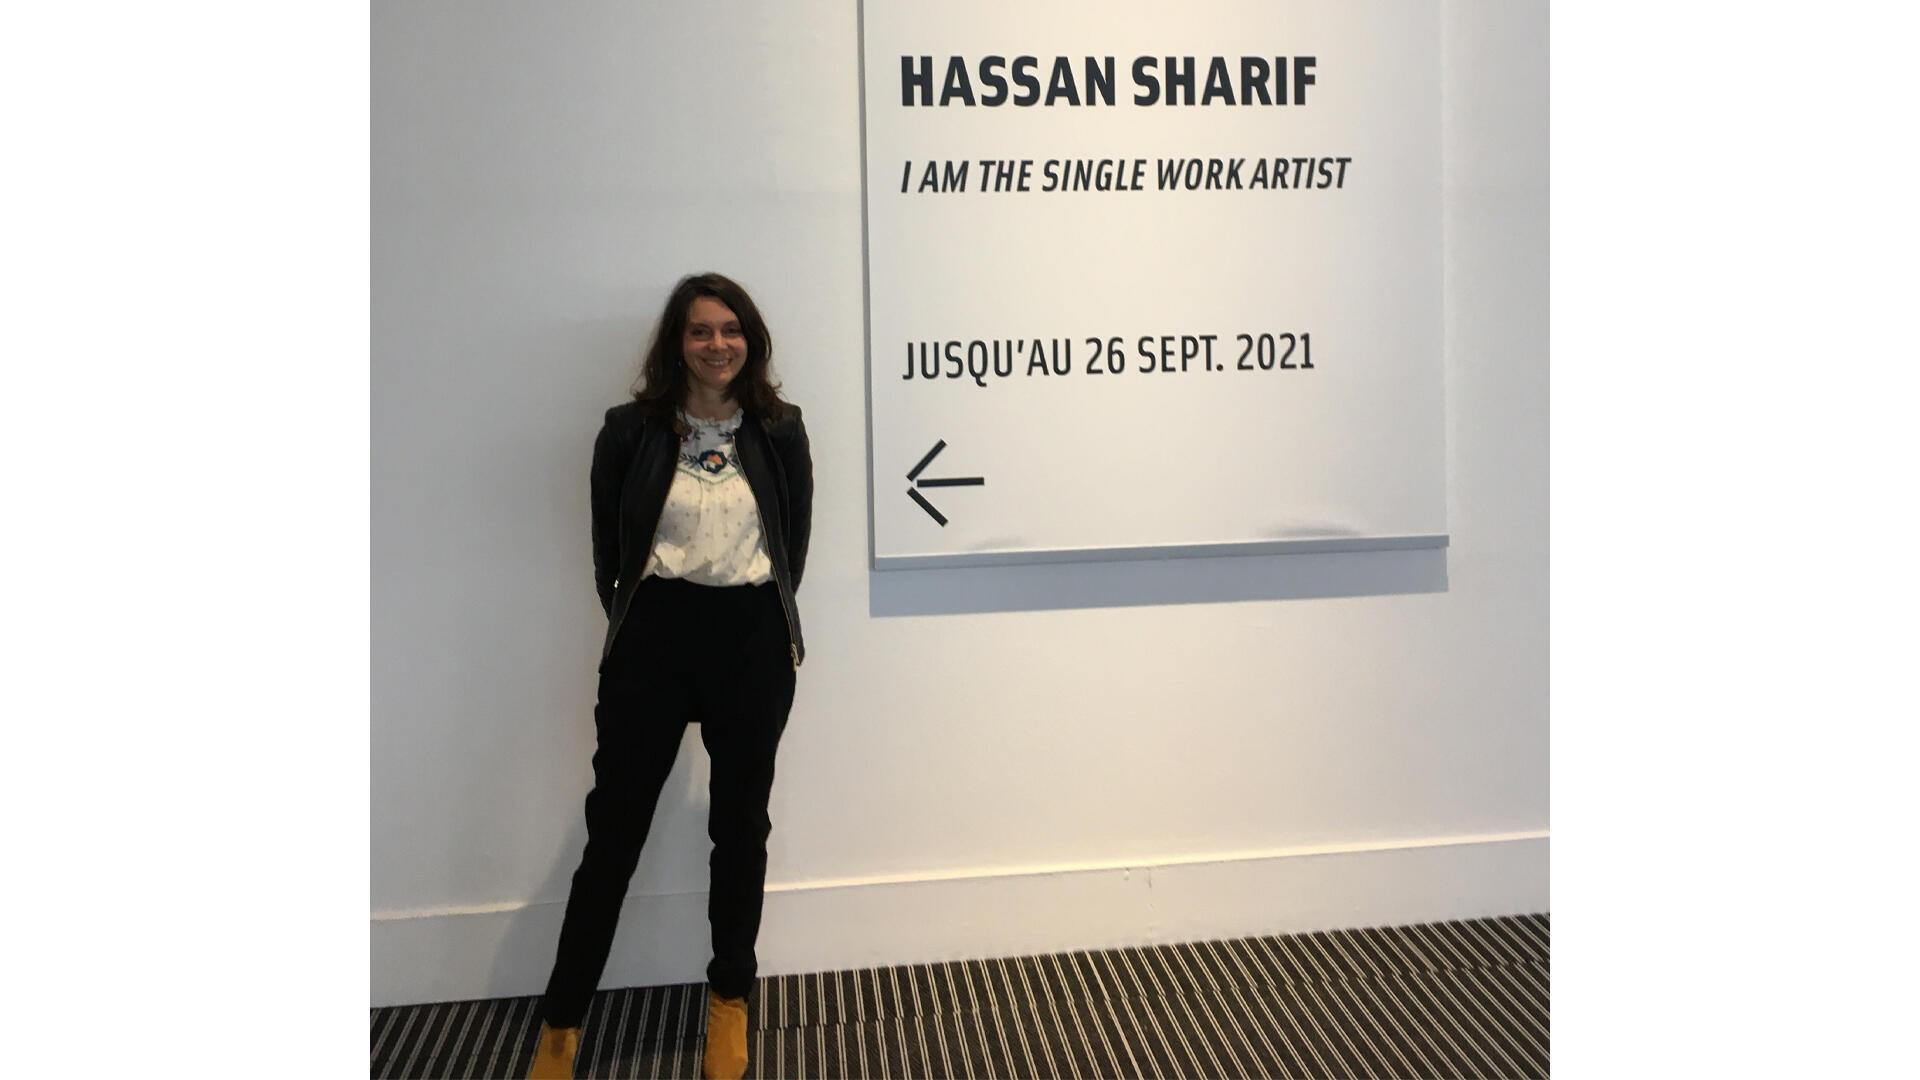 aurélie voltz_hassan sharif-22052021 ok orient hebdo